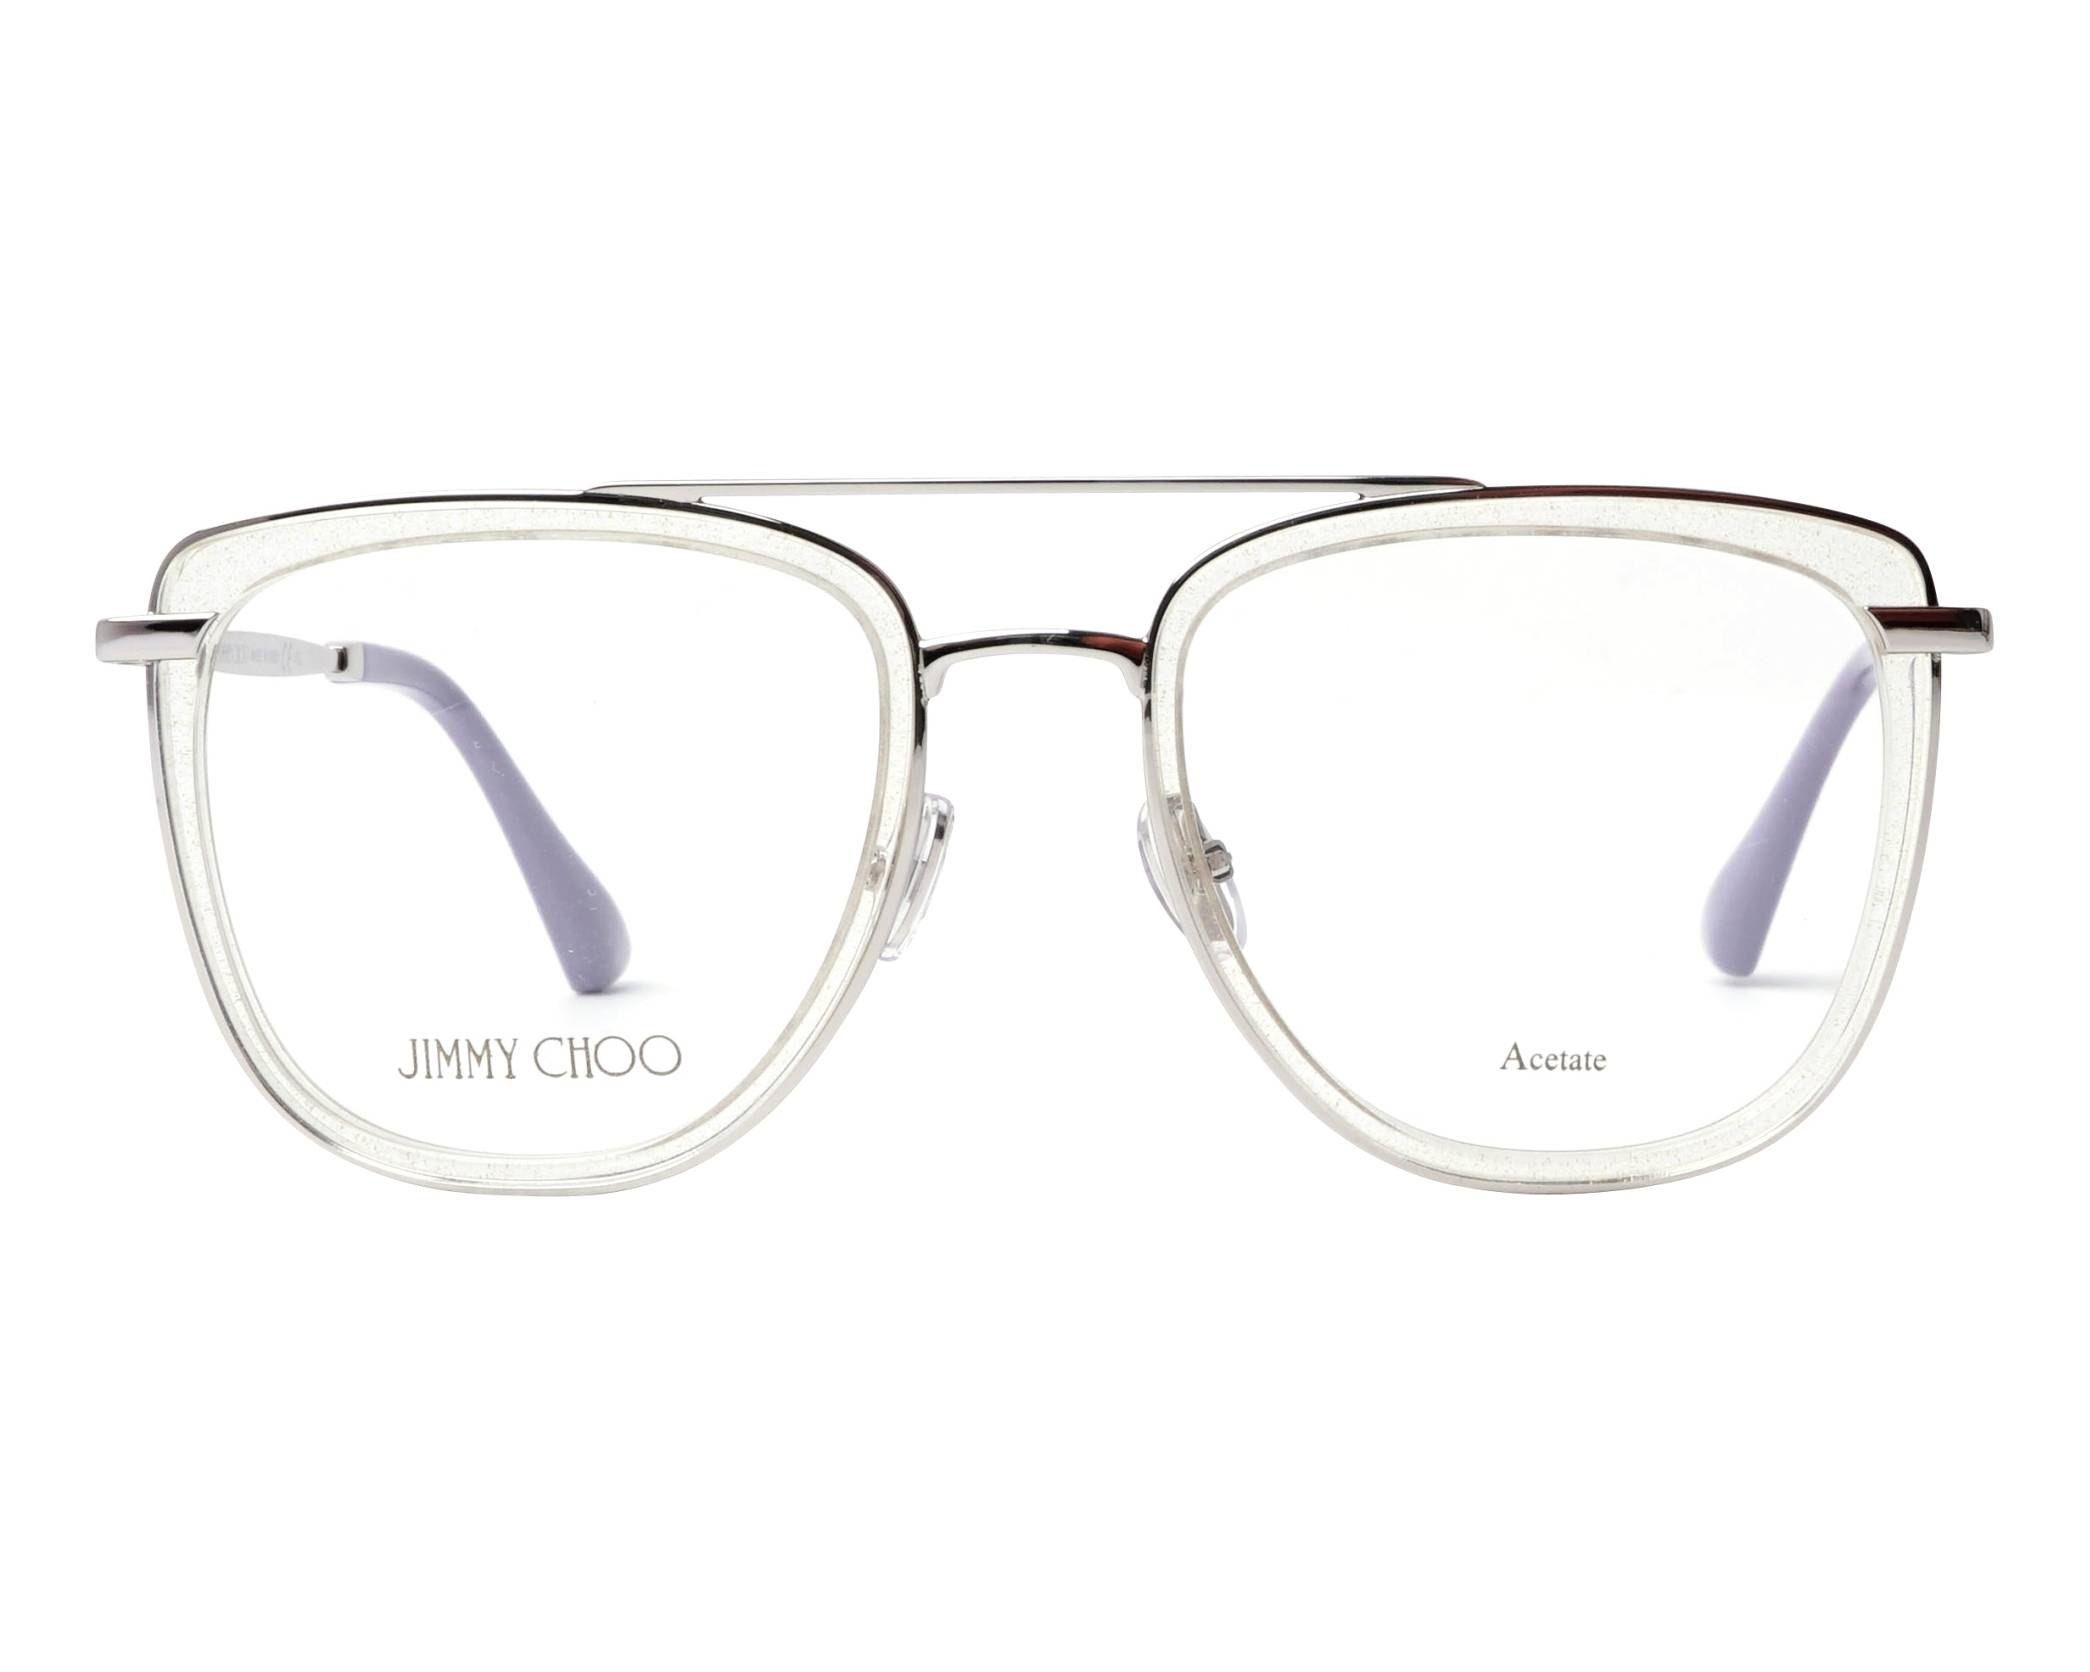 d2022b44c16f eyeglasses Jimmy Choo JC-219 900 52-20 Crystal Silver front view